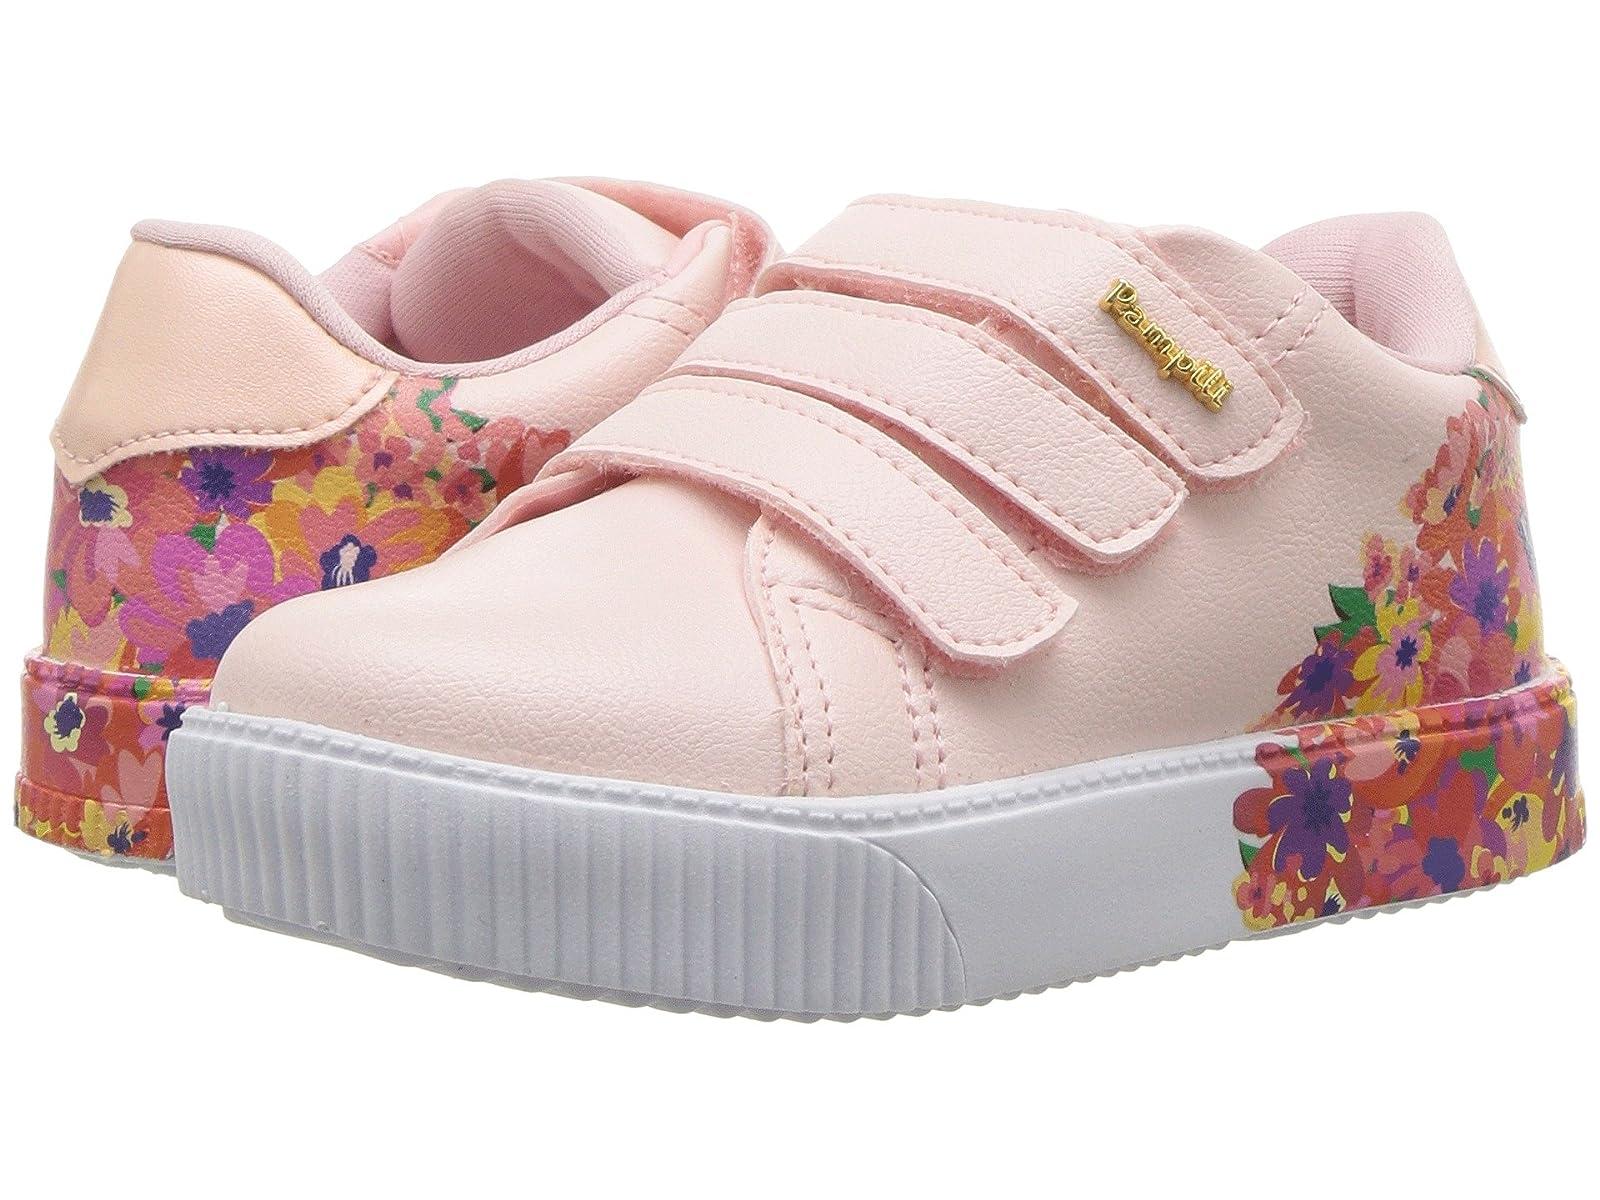 Pampili 435006 (Toddler/Little Kid)Atmospheric grades have affordable shoes